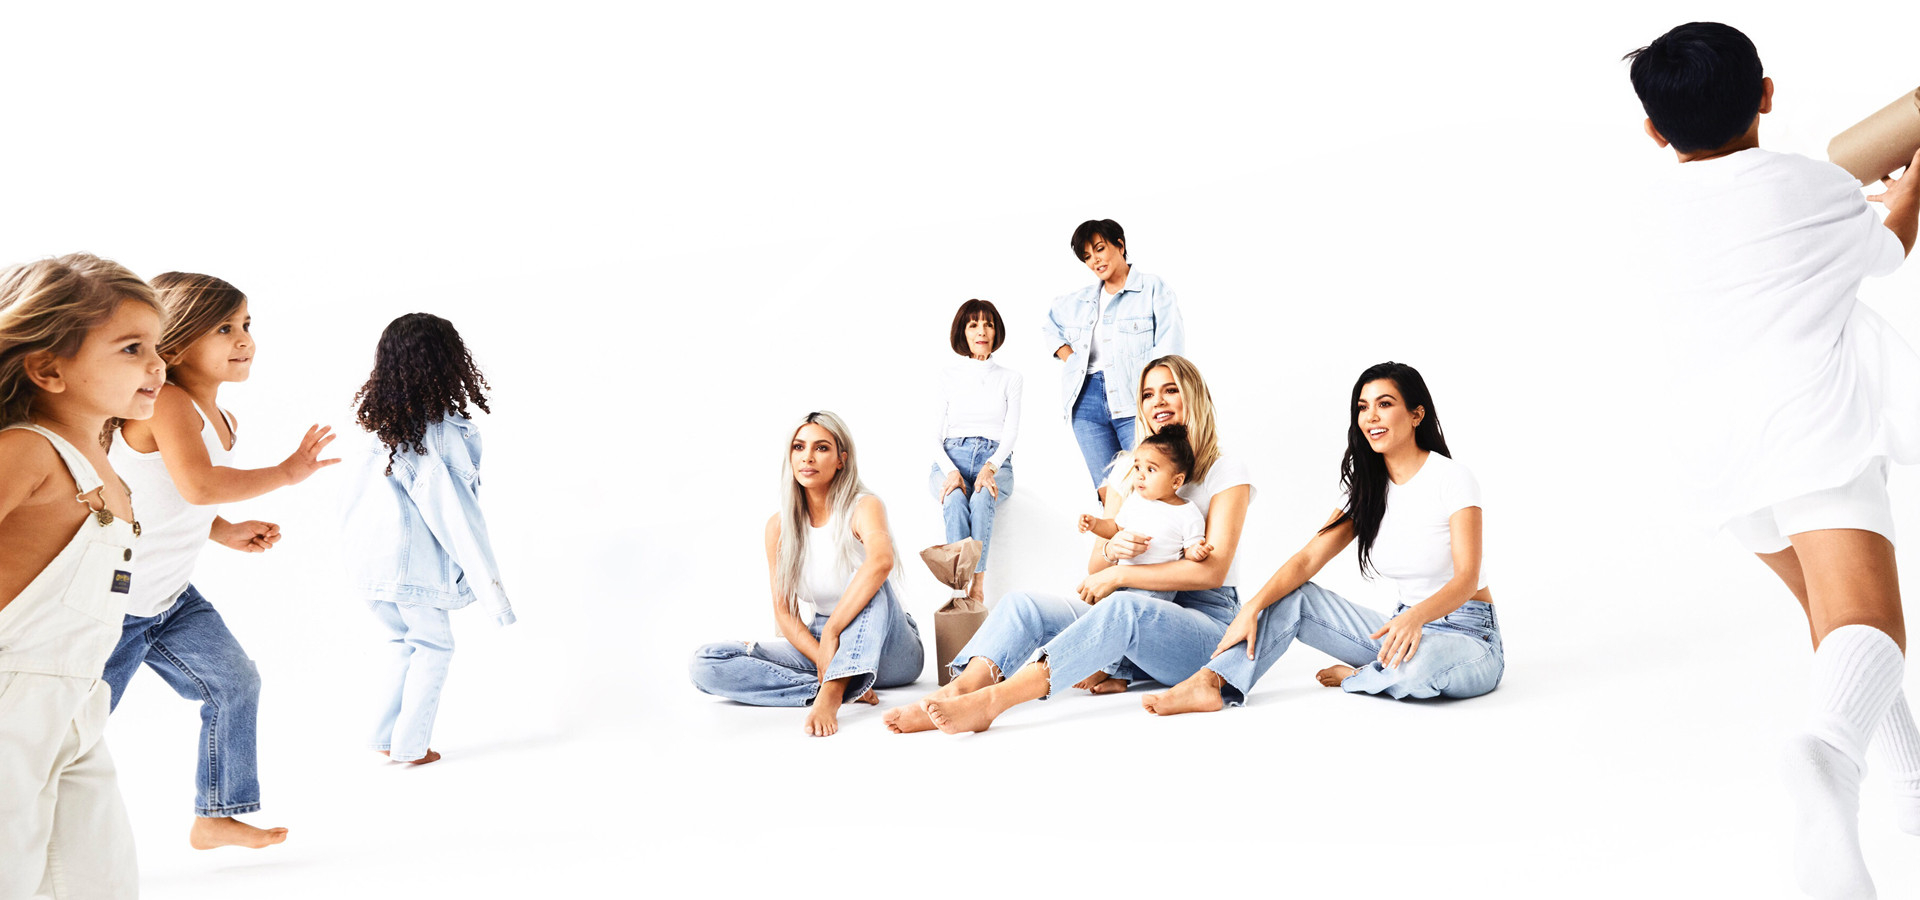 Kardashians | E! News